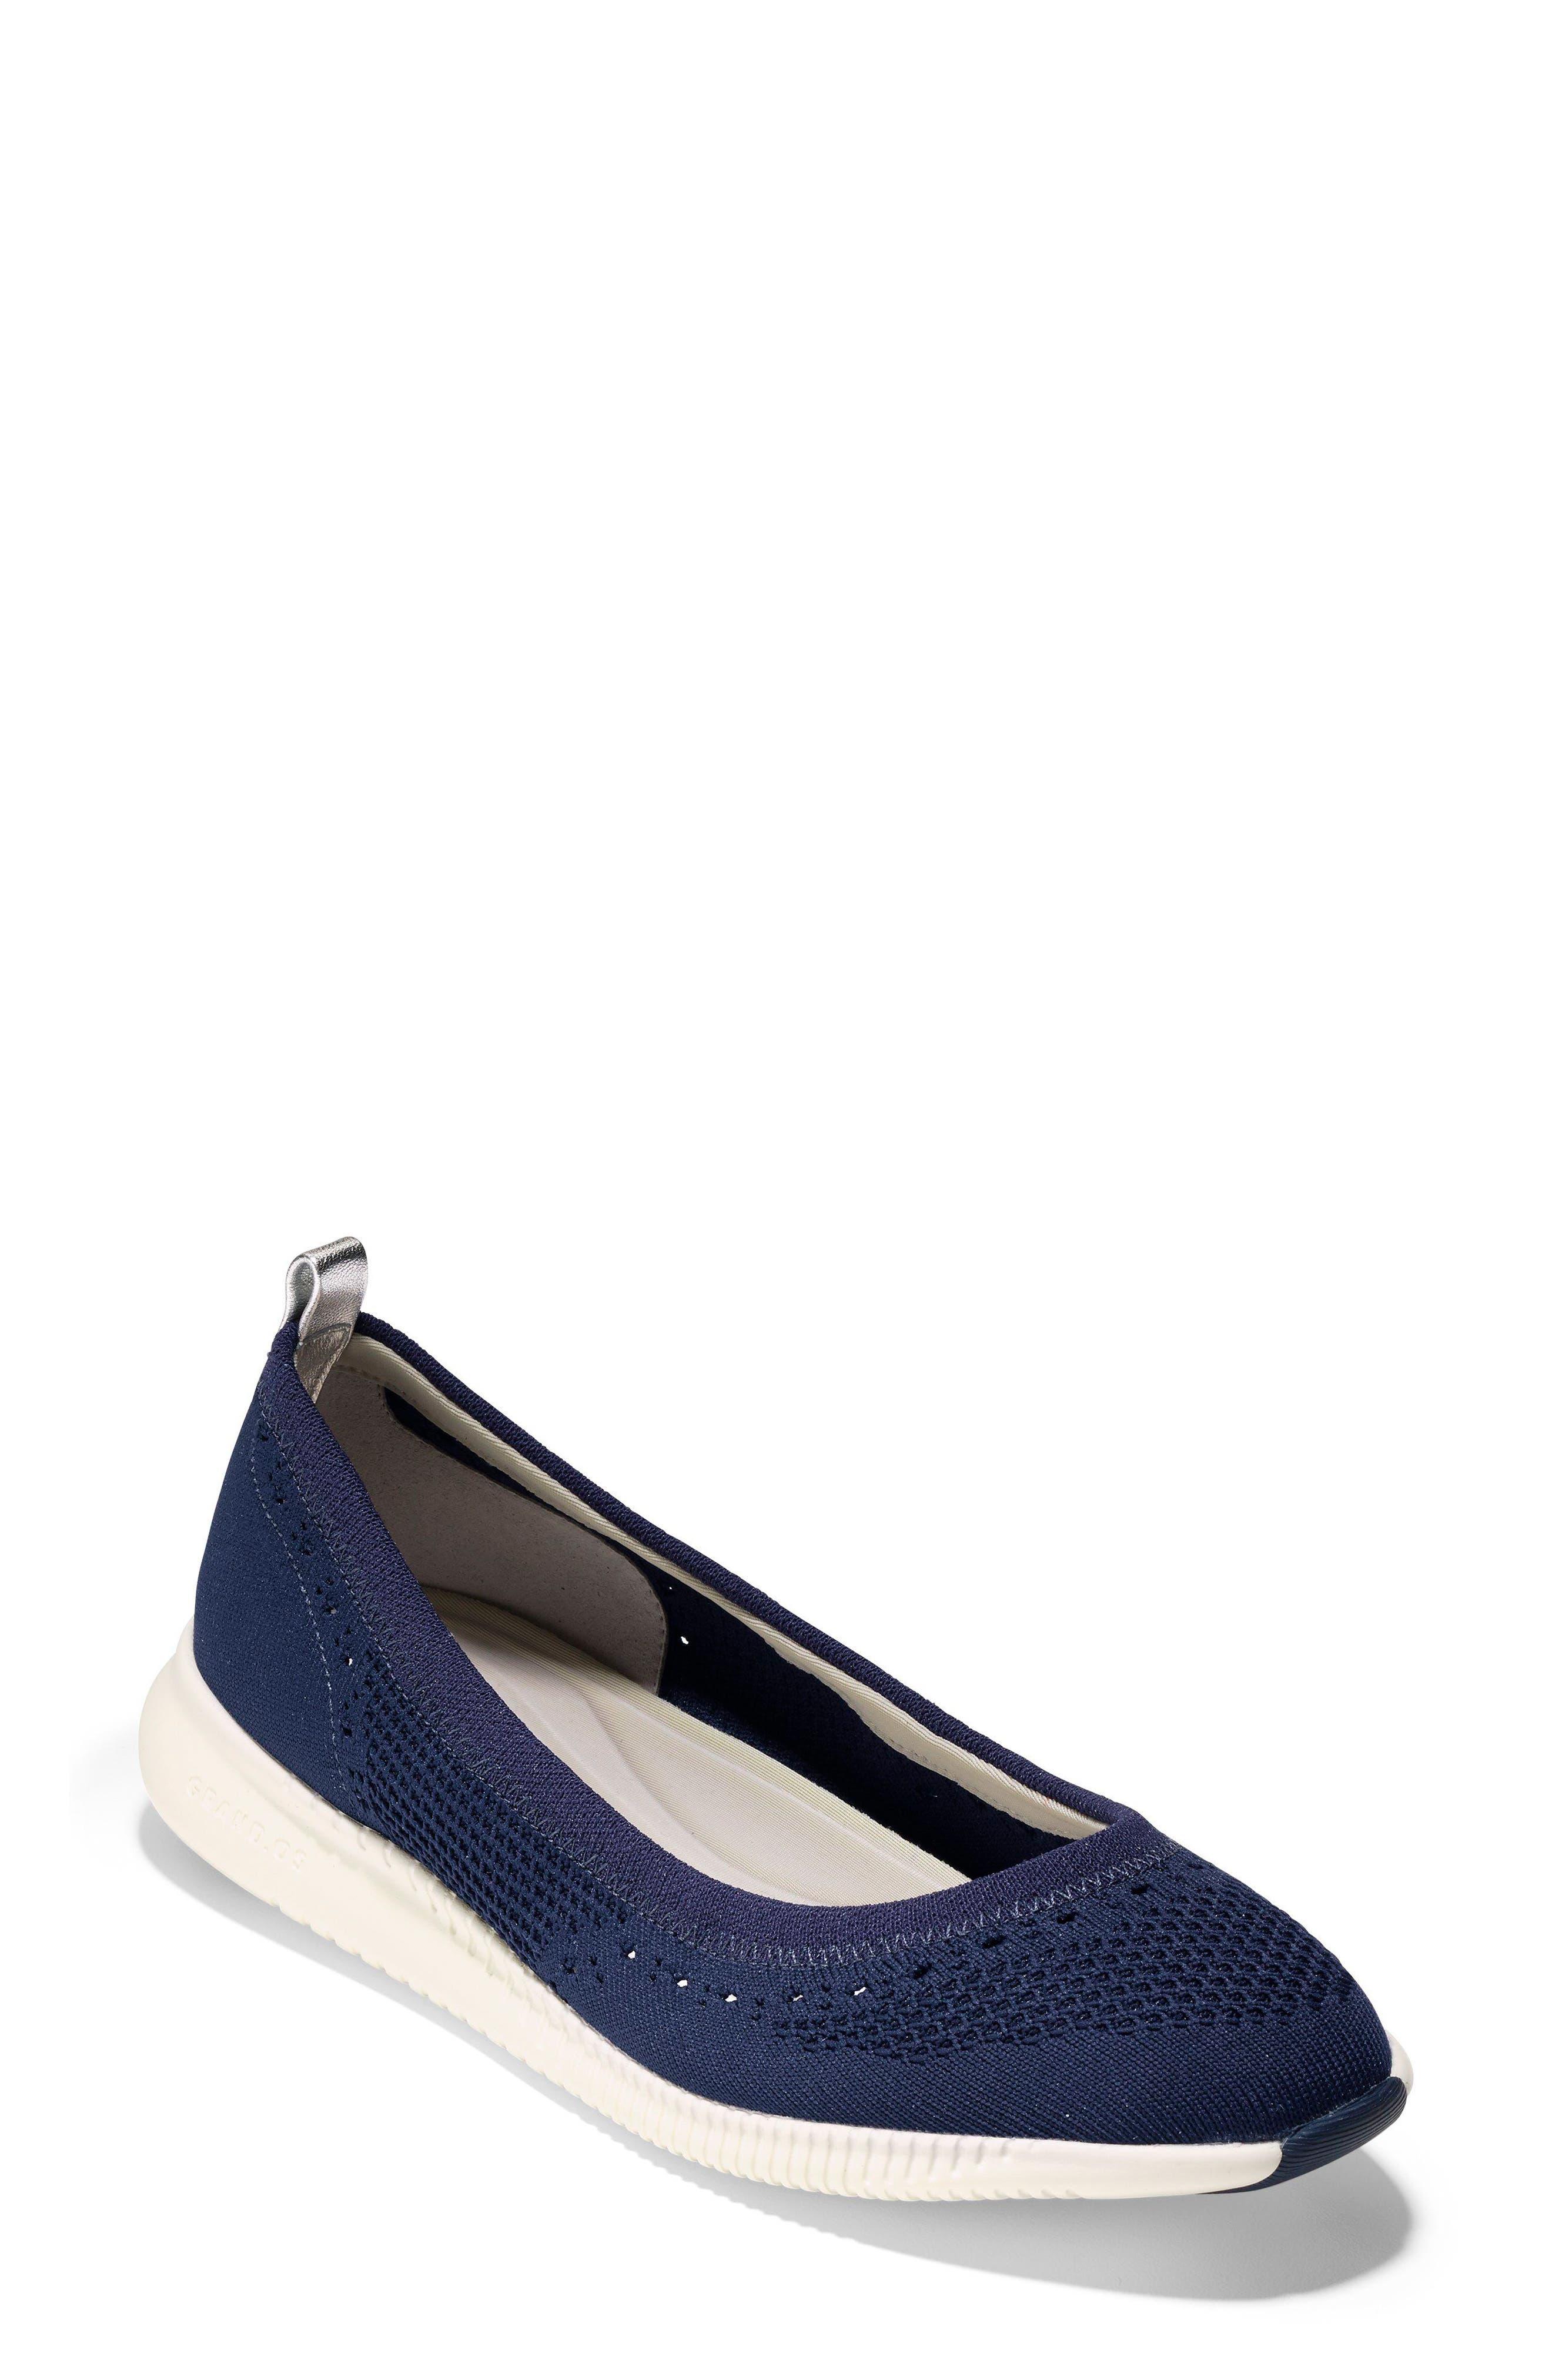 2.ZERØGRAND Stitchlite Ballet Flat,                         Main,                         color, MARINE BLUE KNIT